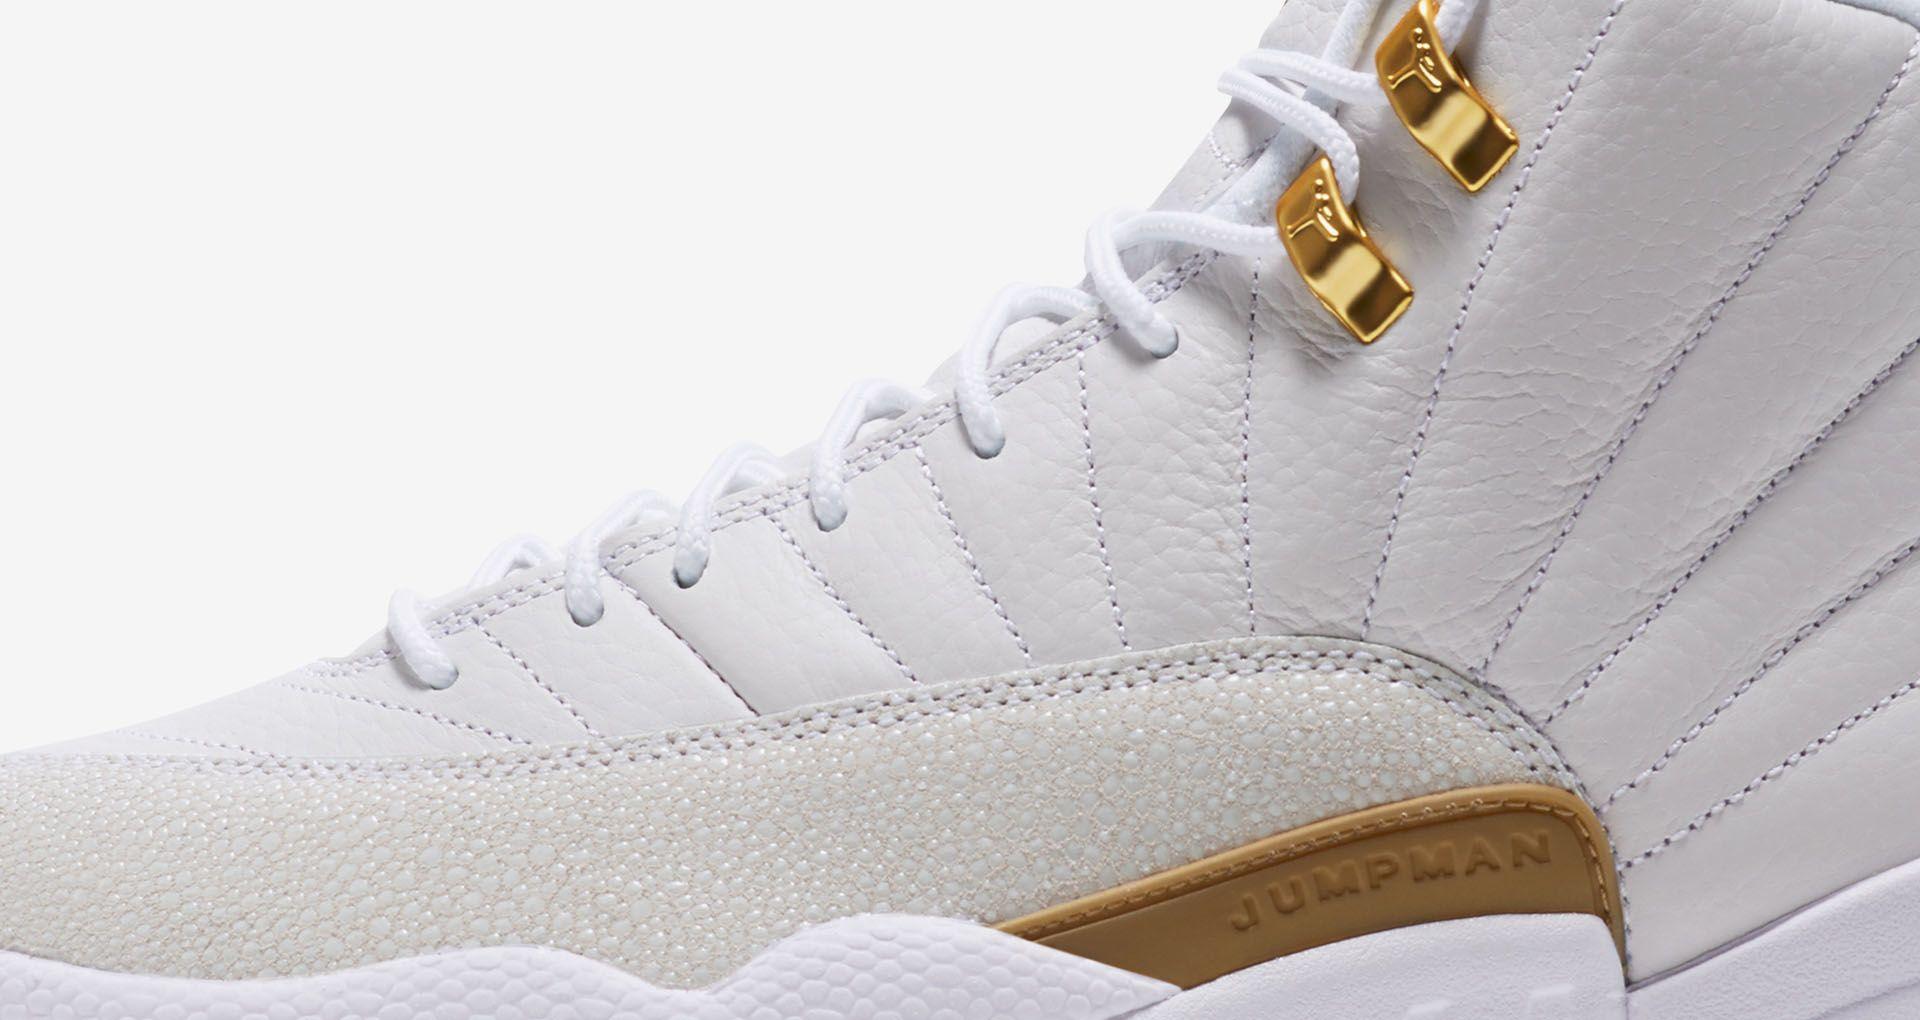 lowest price 68f6e 64584 Air Jordan 12 OVO 'White & Metallic Gold' Release Date. Nike ...